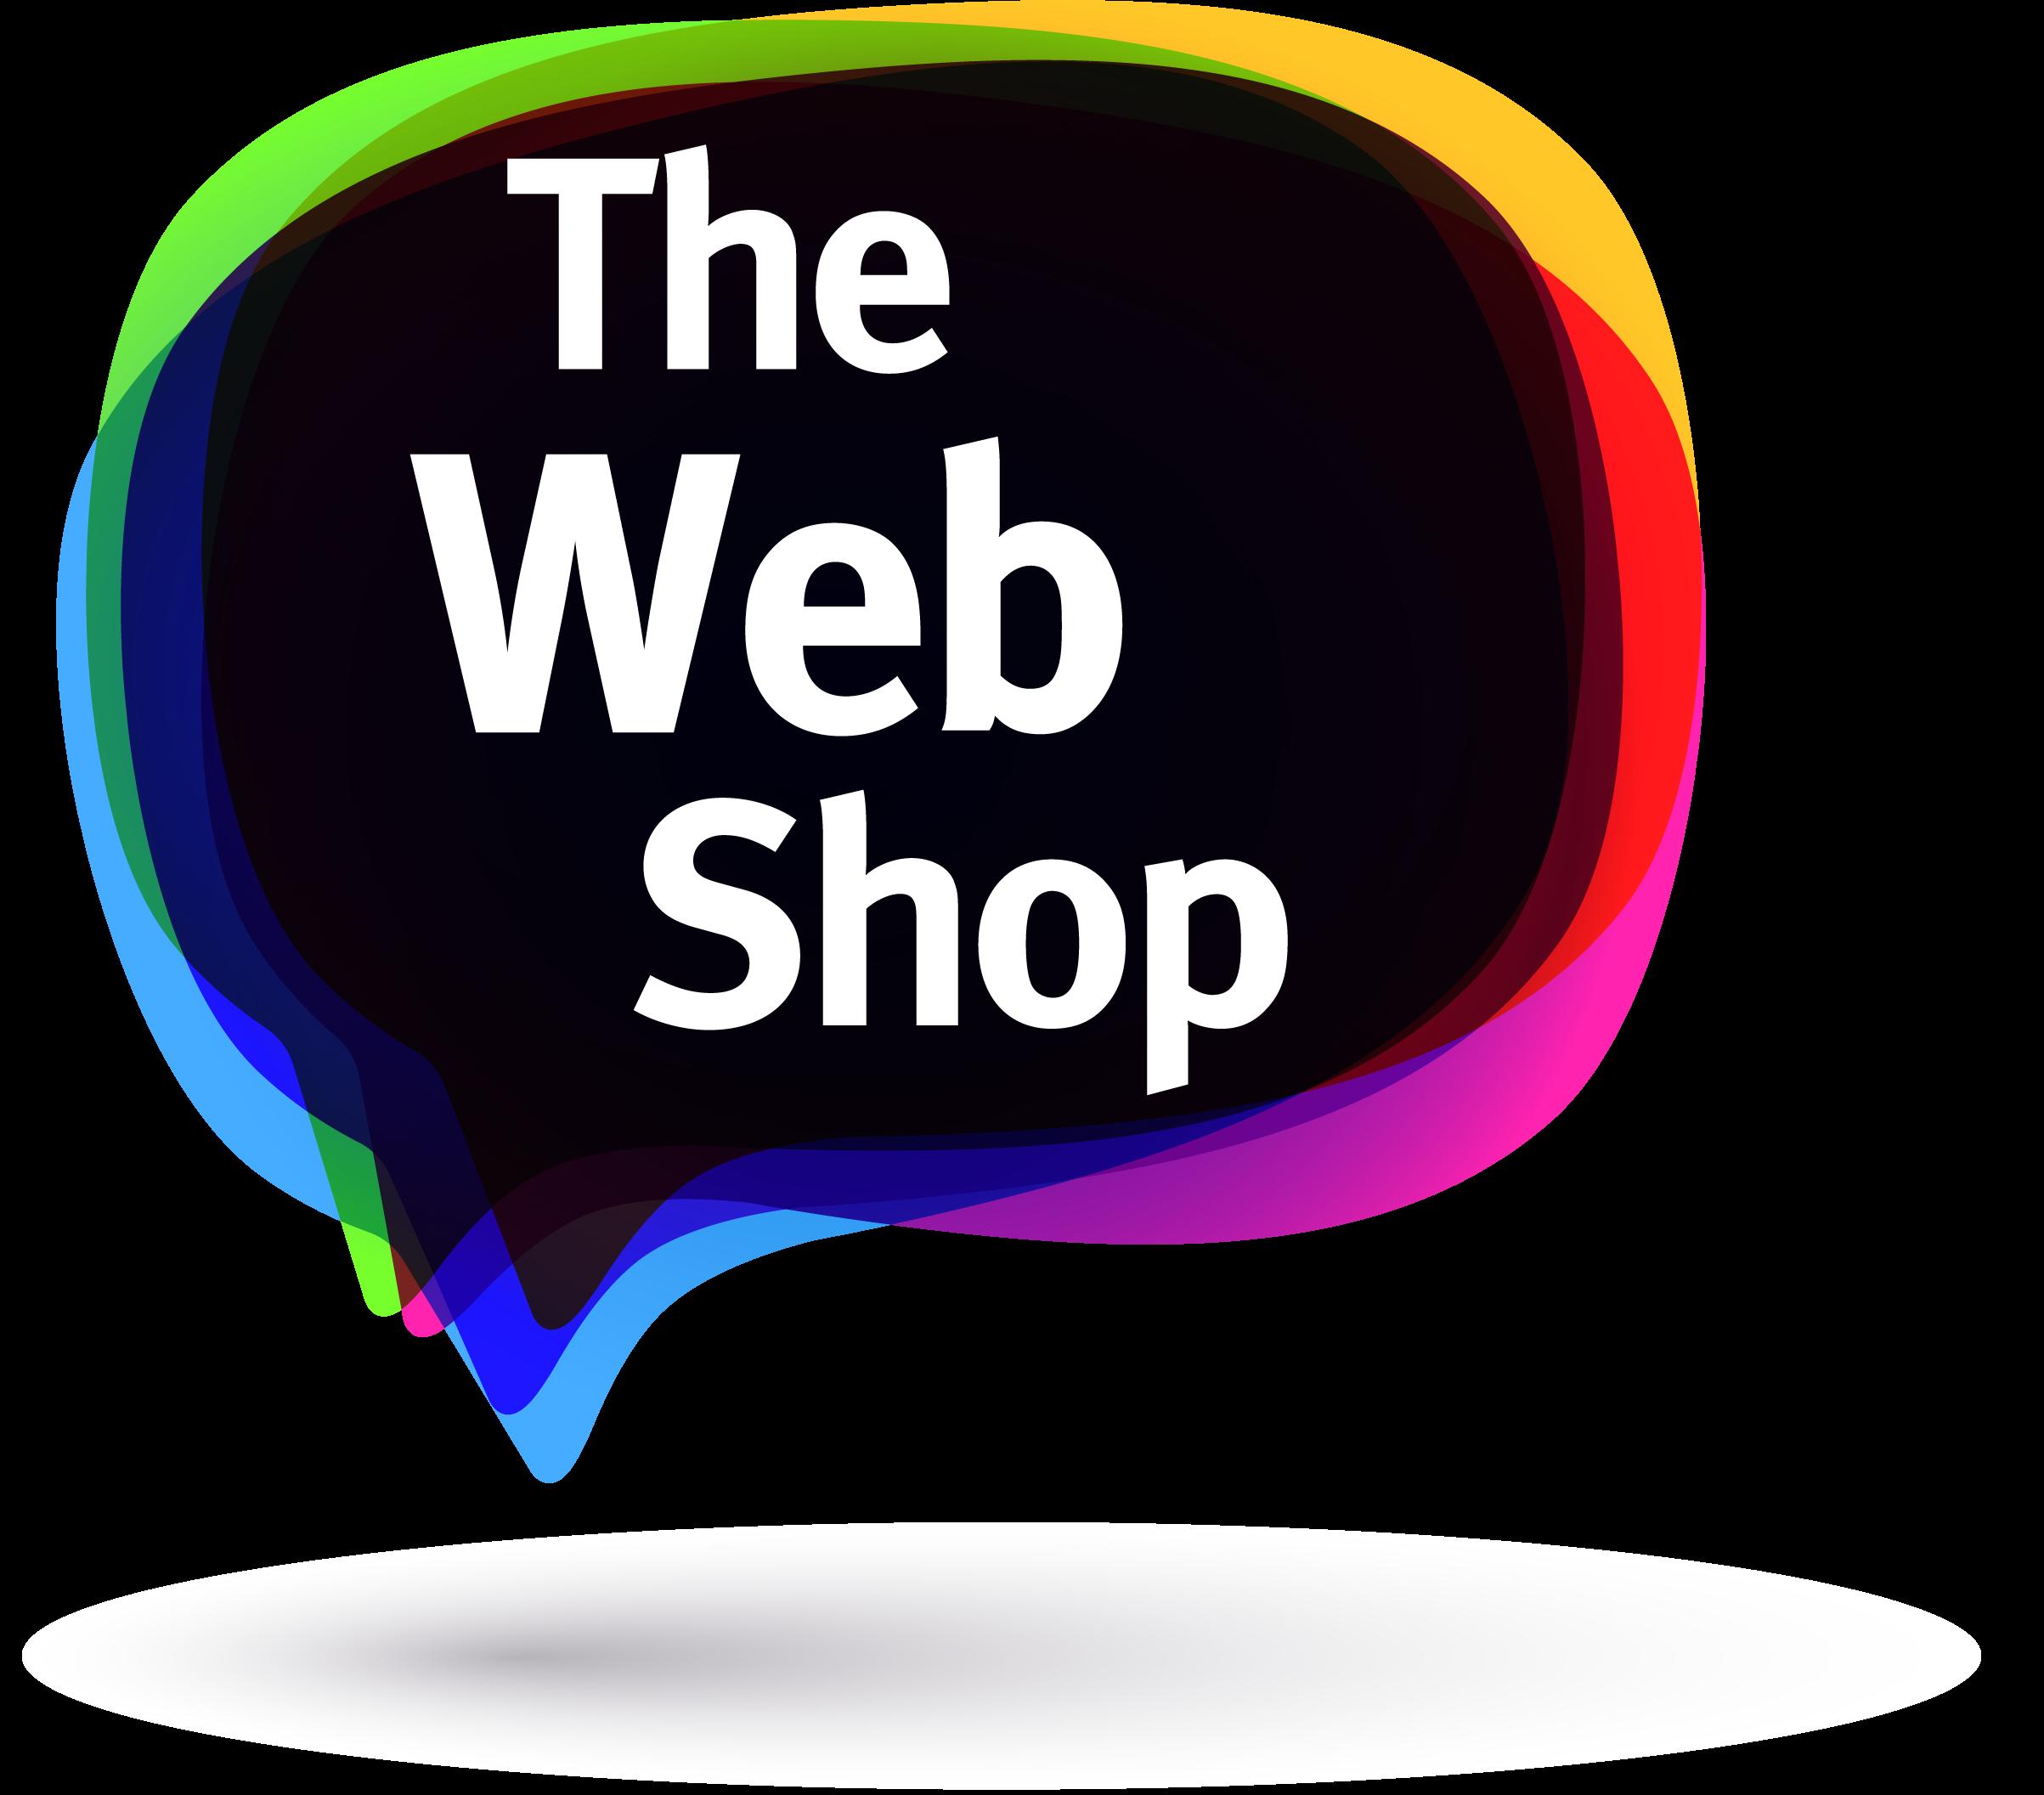 TheWebShop-LOGO